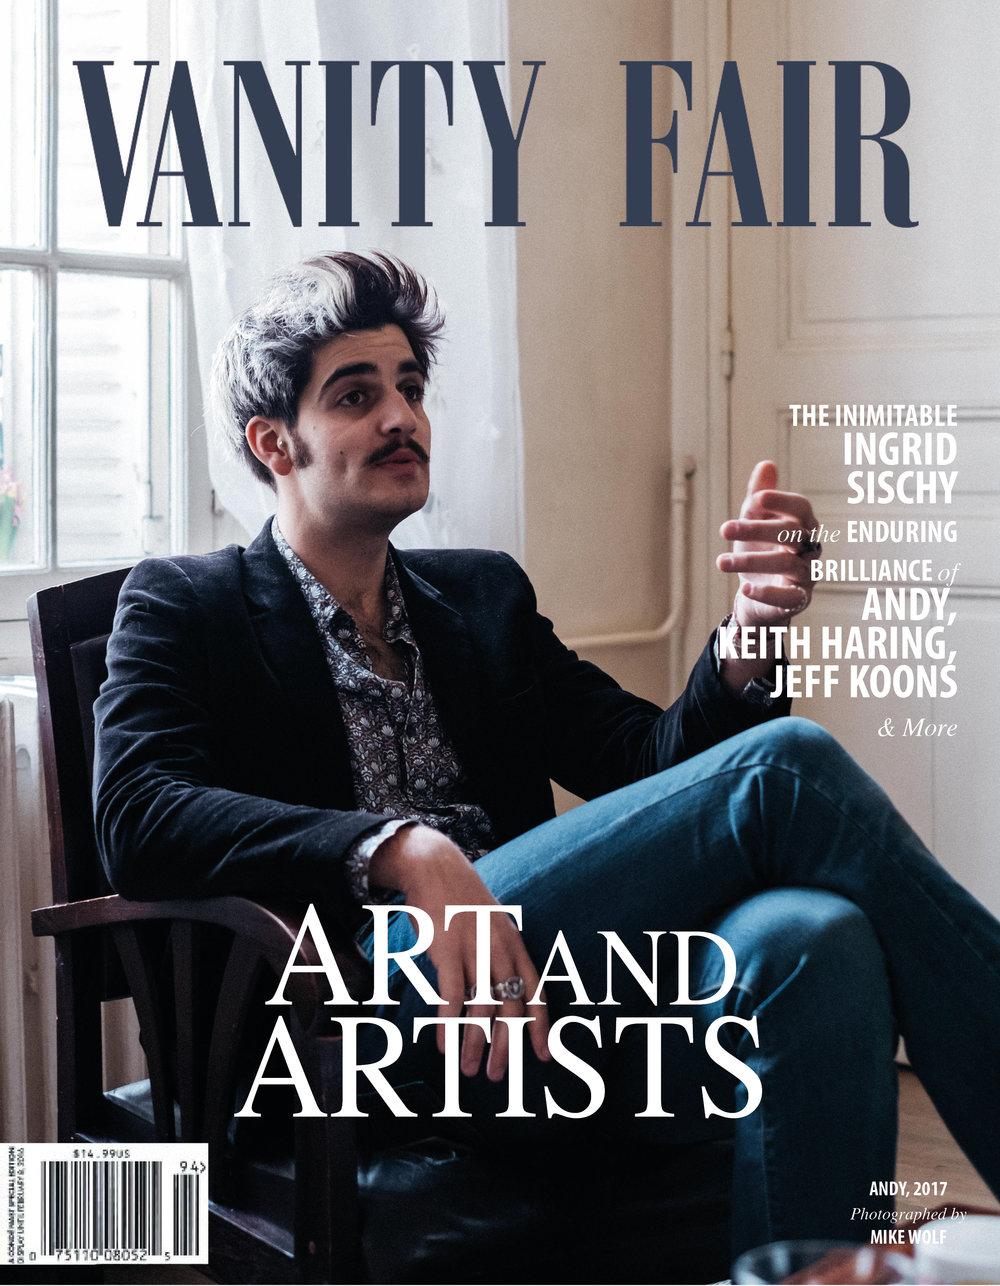 Andy Picci x Vanity Fair